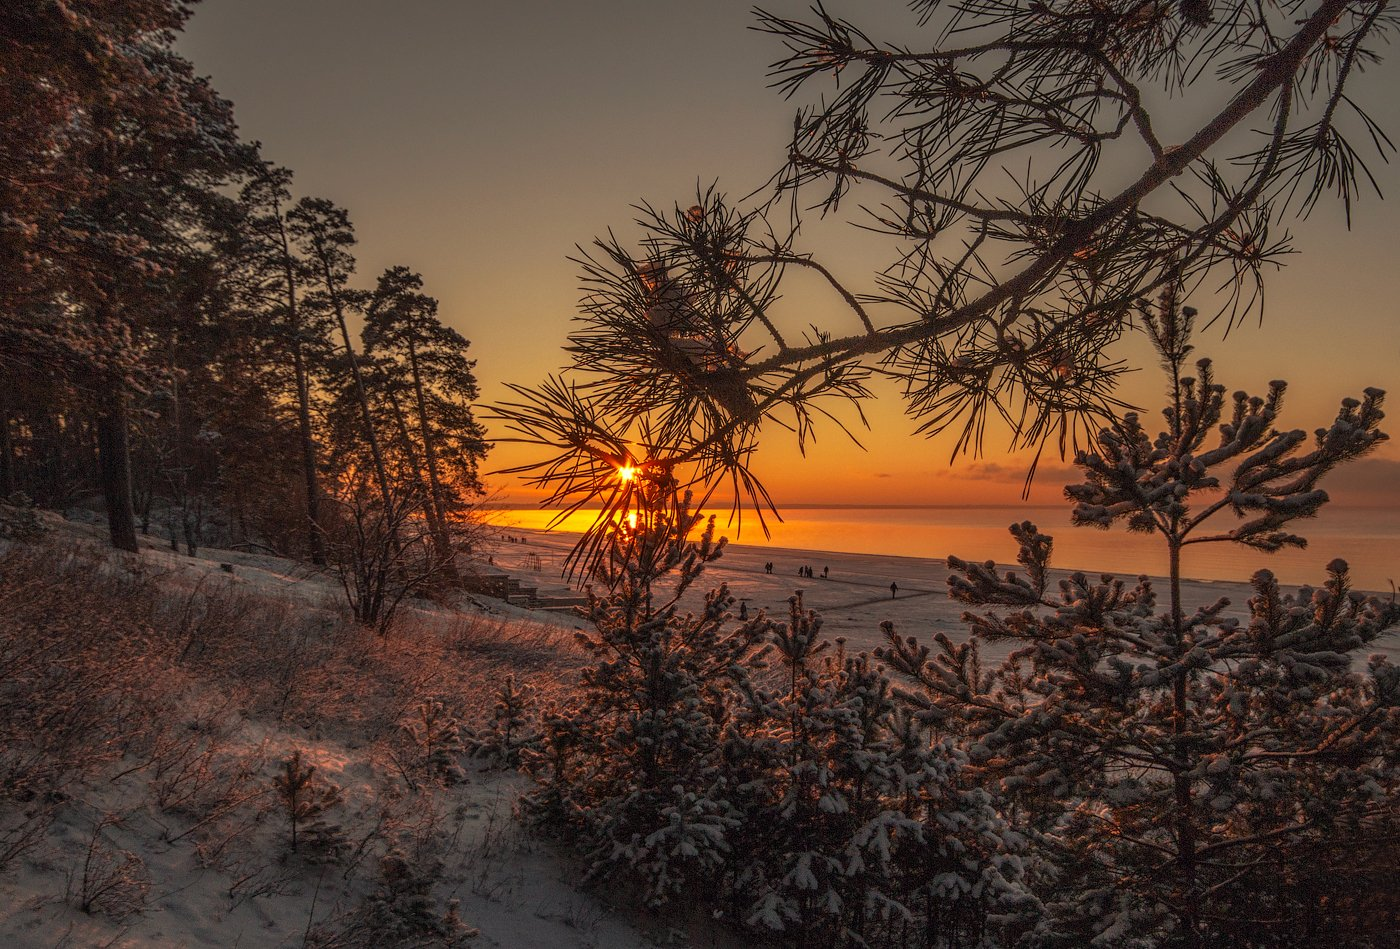 Закат, Зима, Усть-Нарва, Эстония, Kljuchenkow Aleksandr